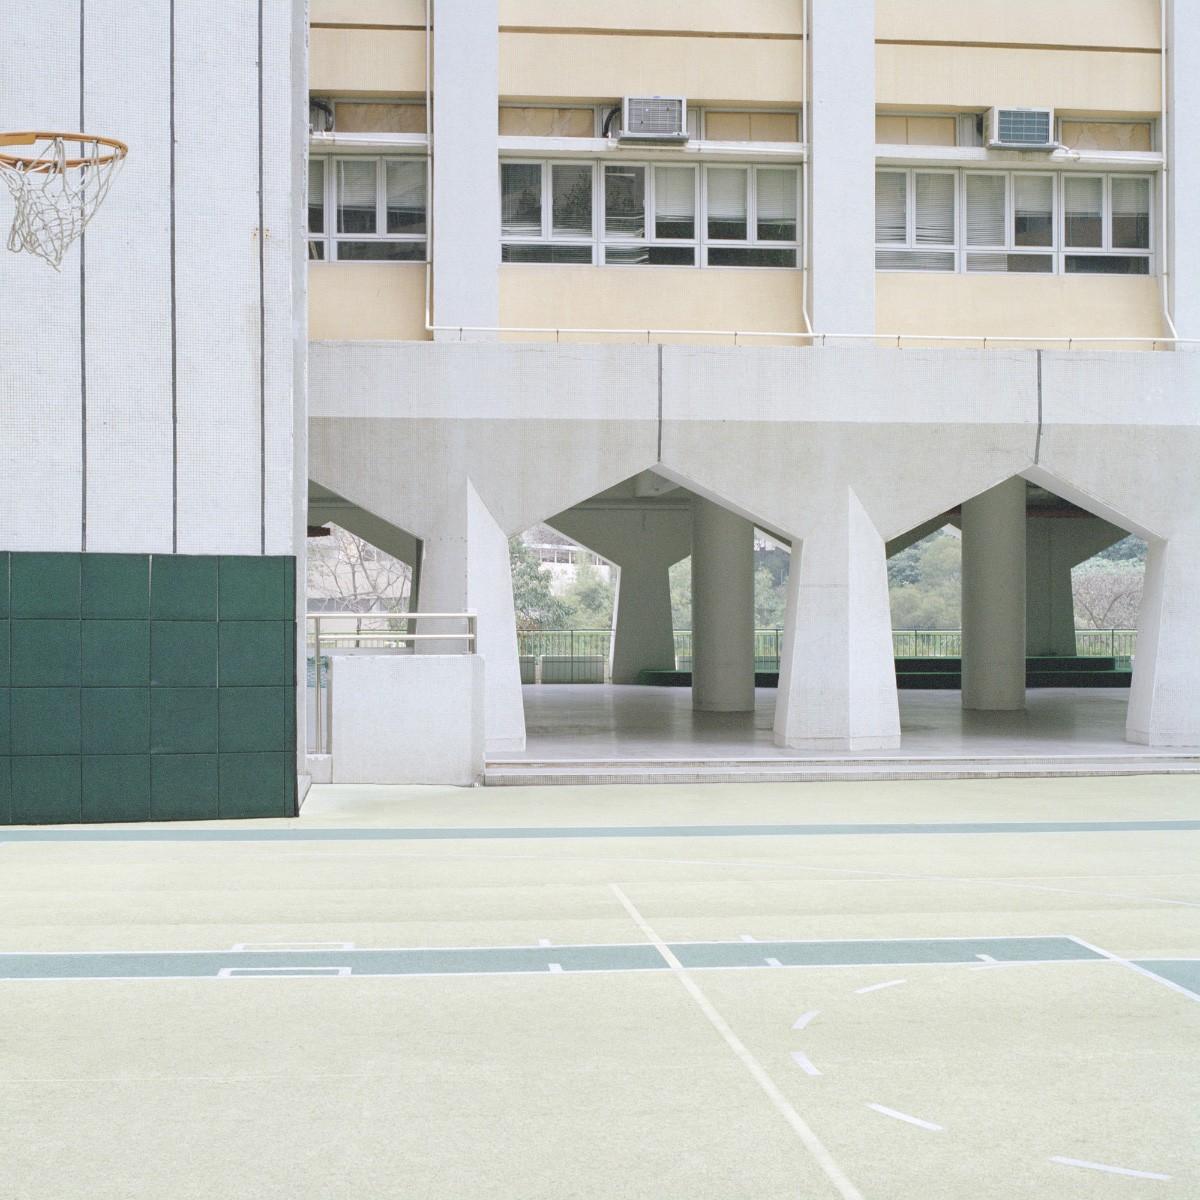 ward-roberts-courts-02.2-61245f4c65dfae0c86b6f49c7be723c5